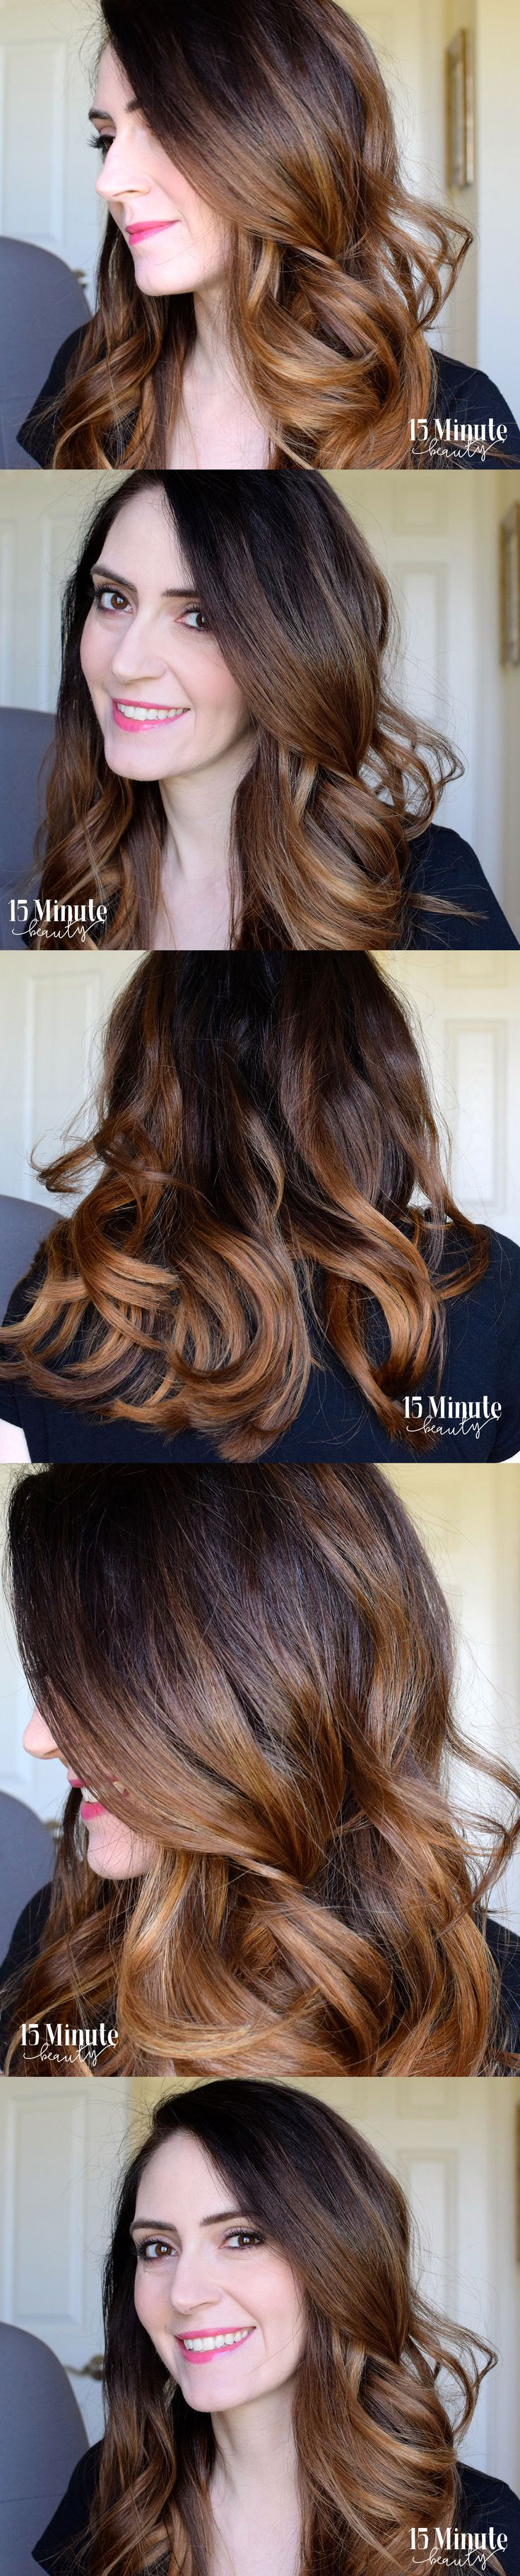 367 best 15 Minute Hair images on Pinterest